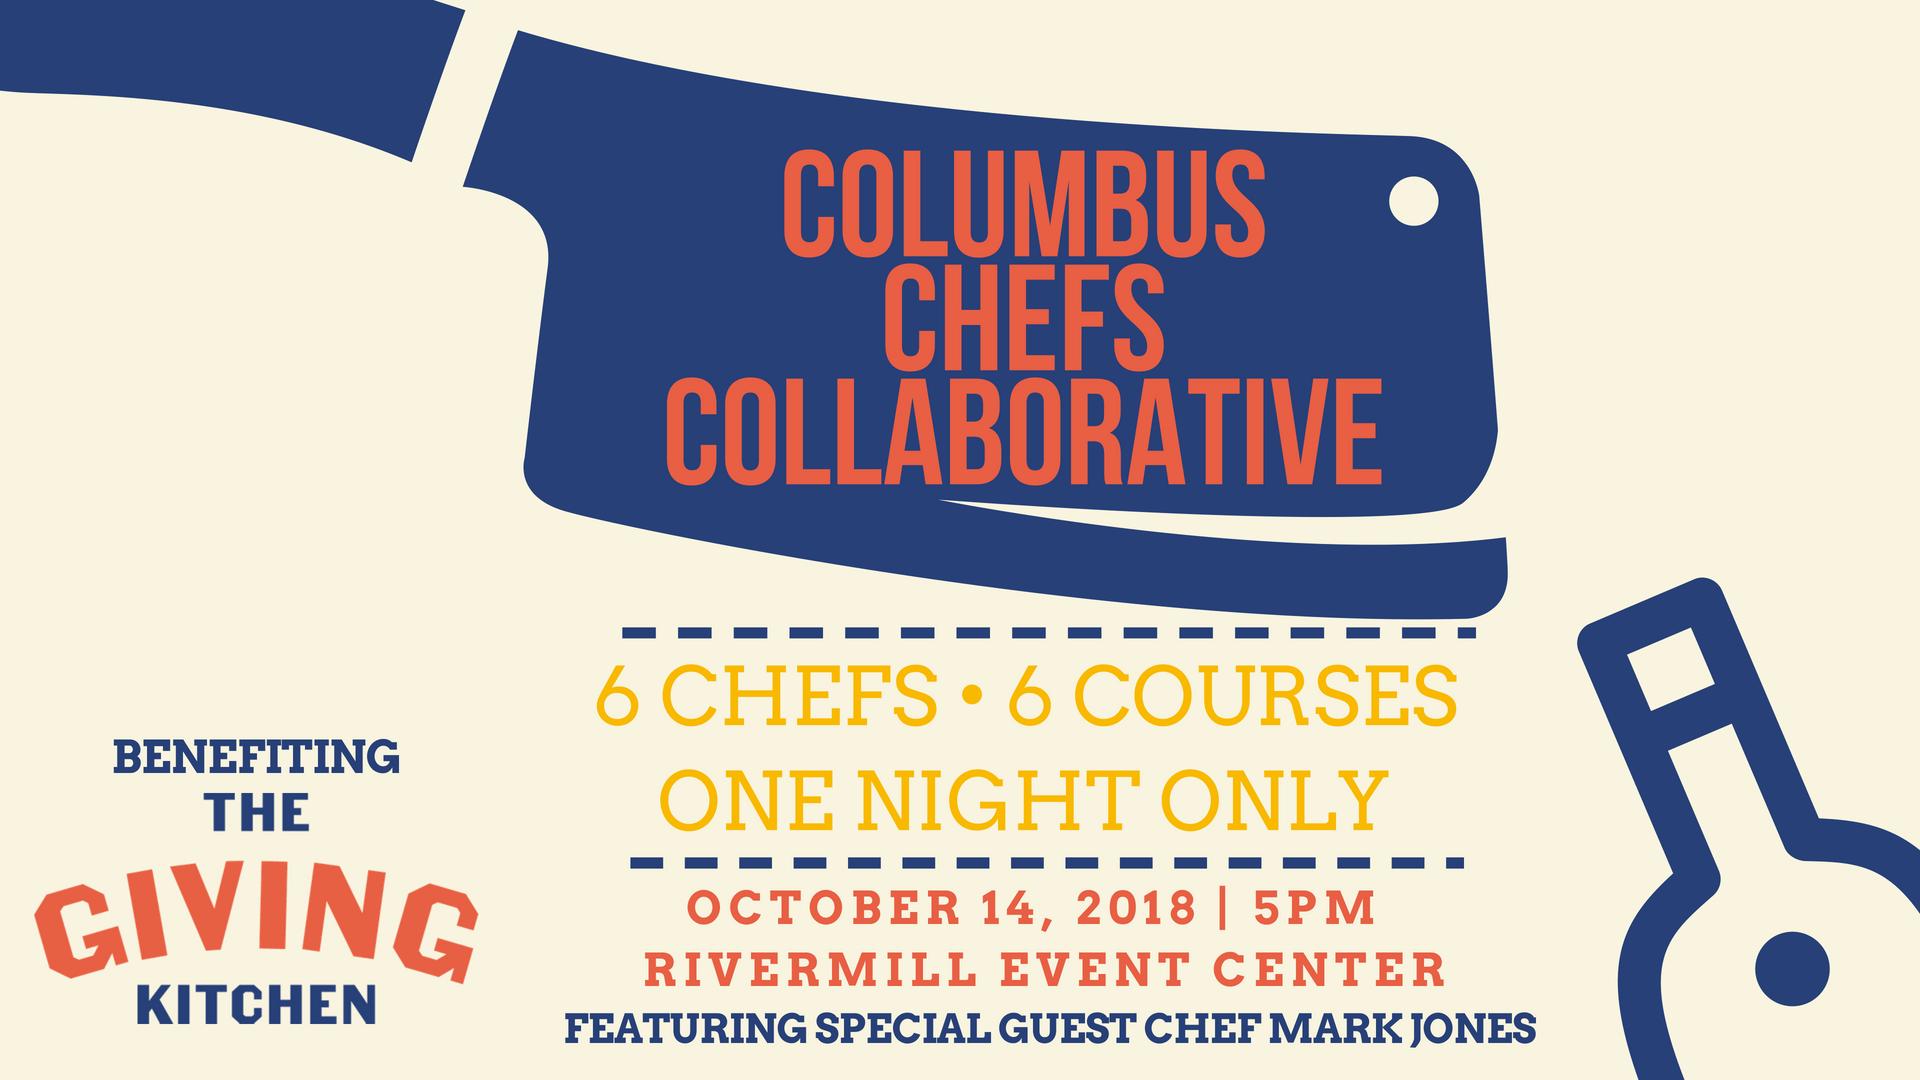 Columbus Chefs Collaborative Dinner